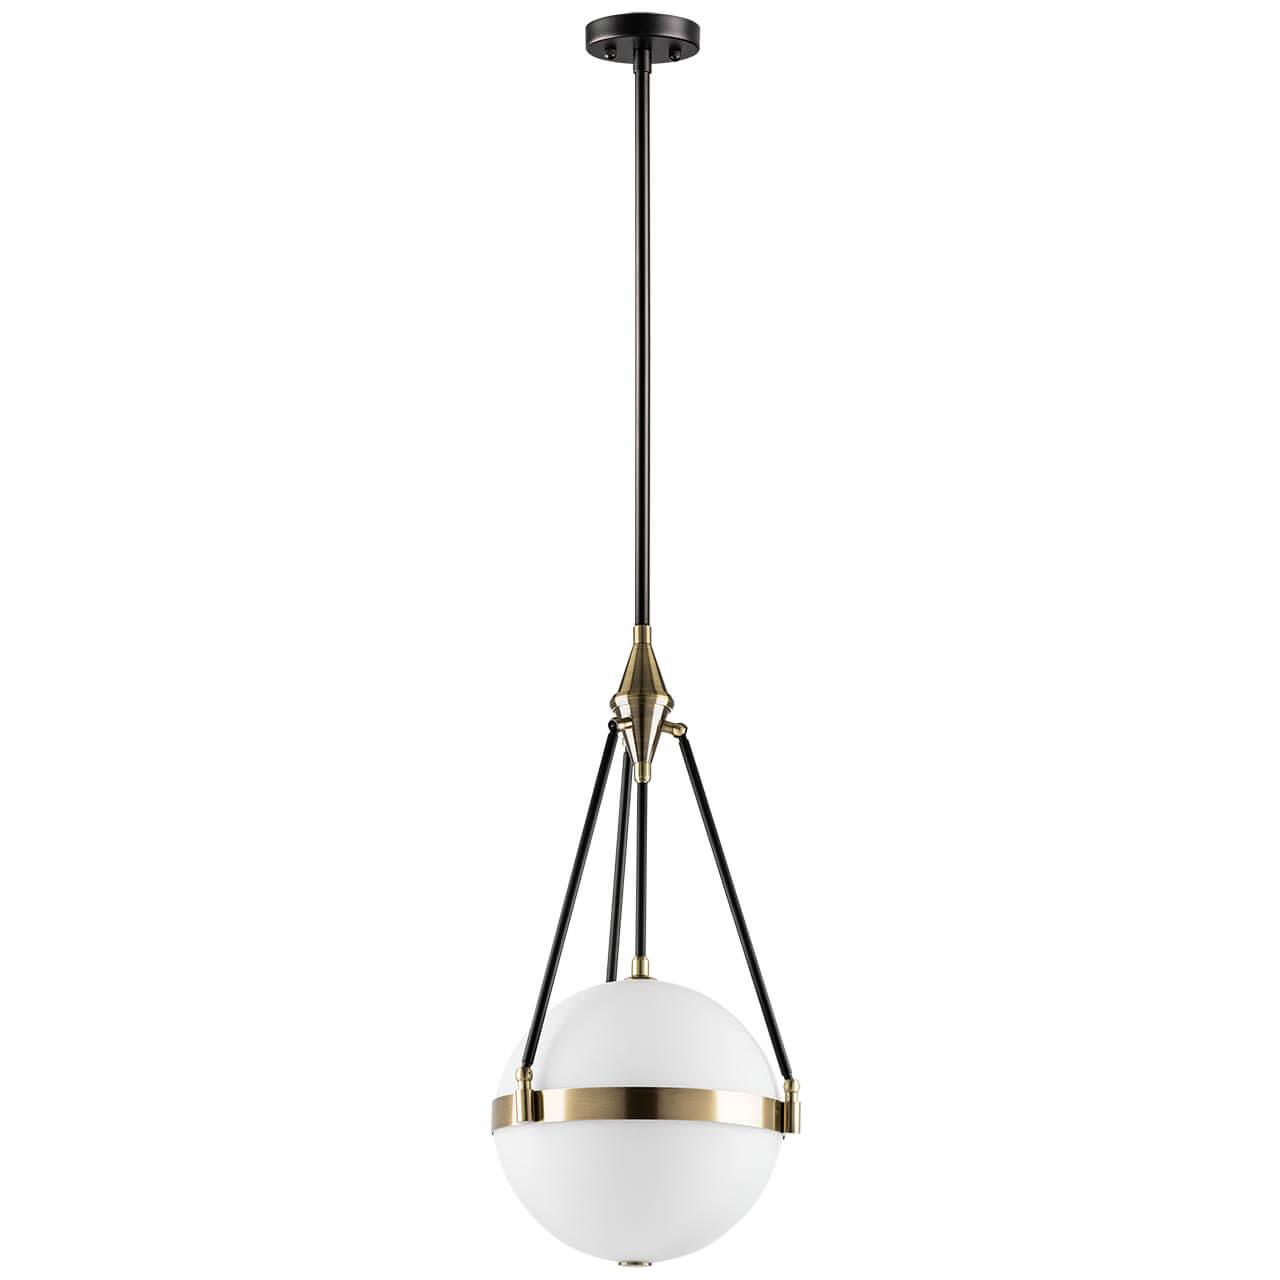 Светильник Lightstar 816037 Modena